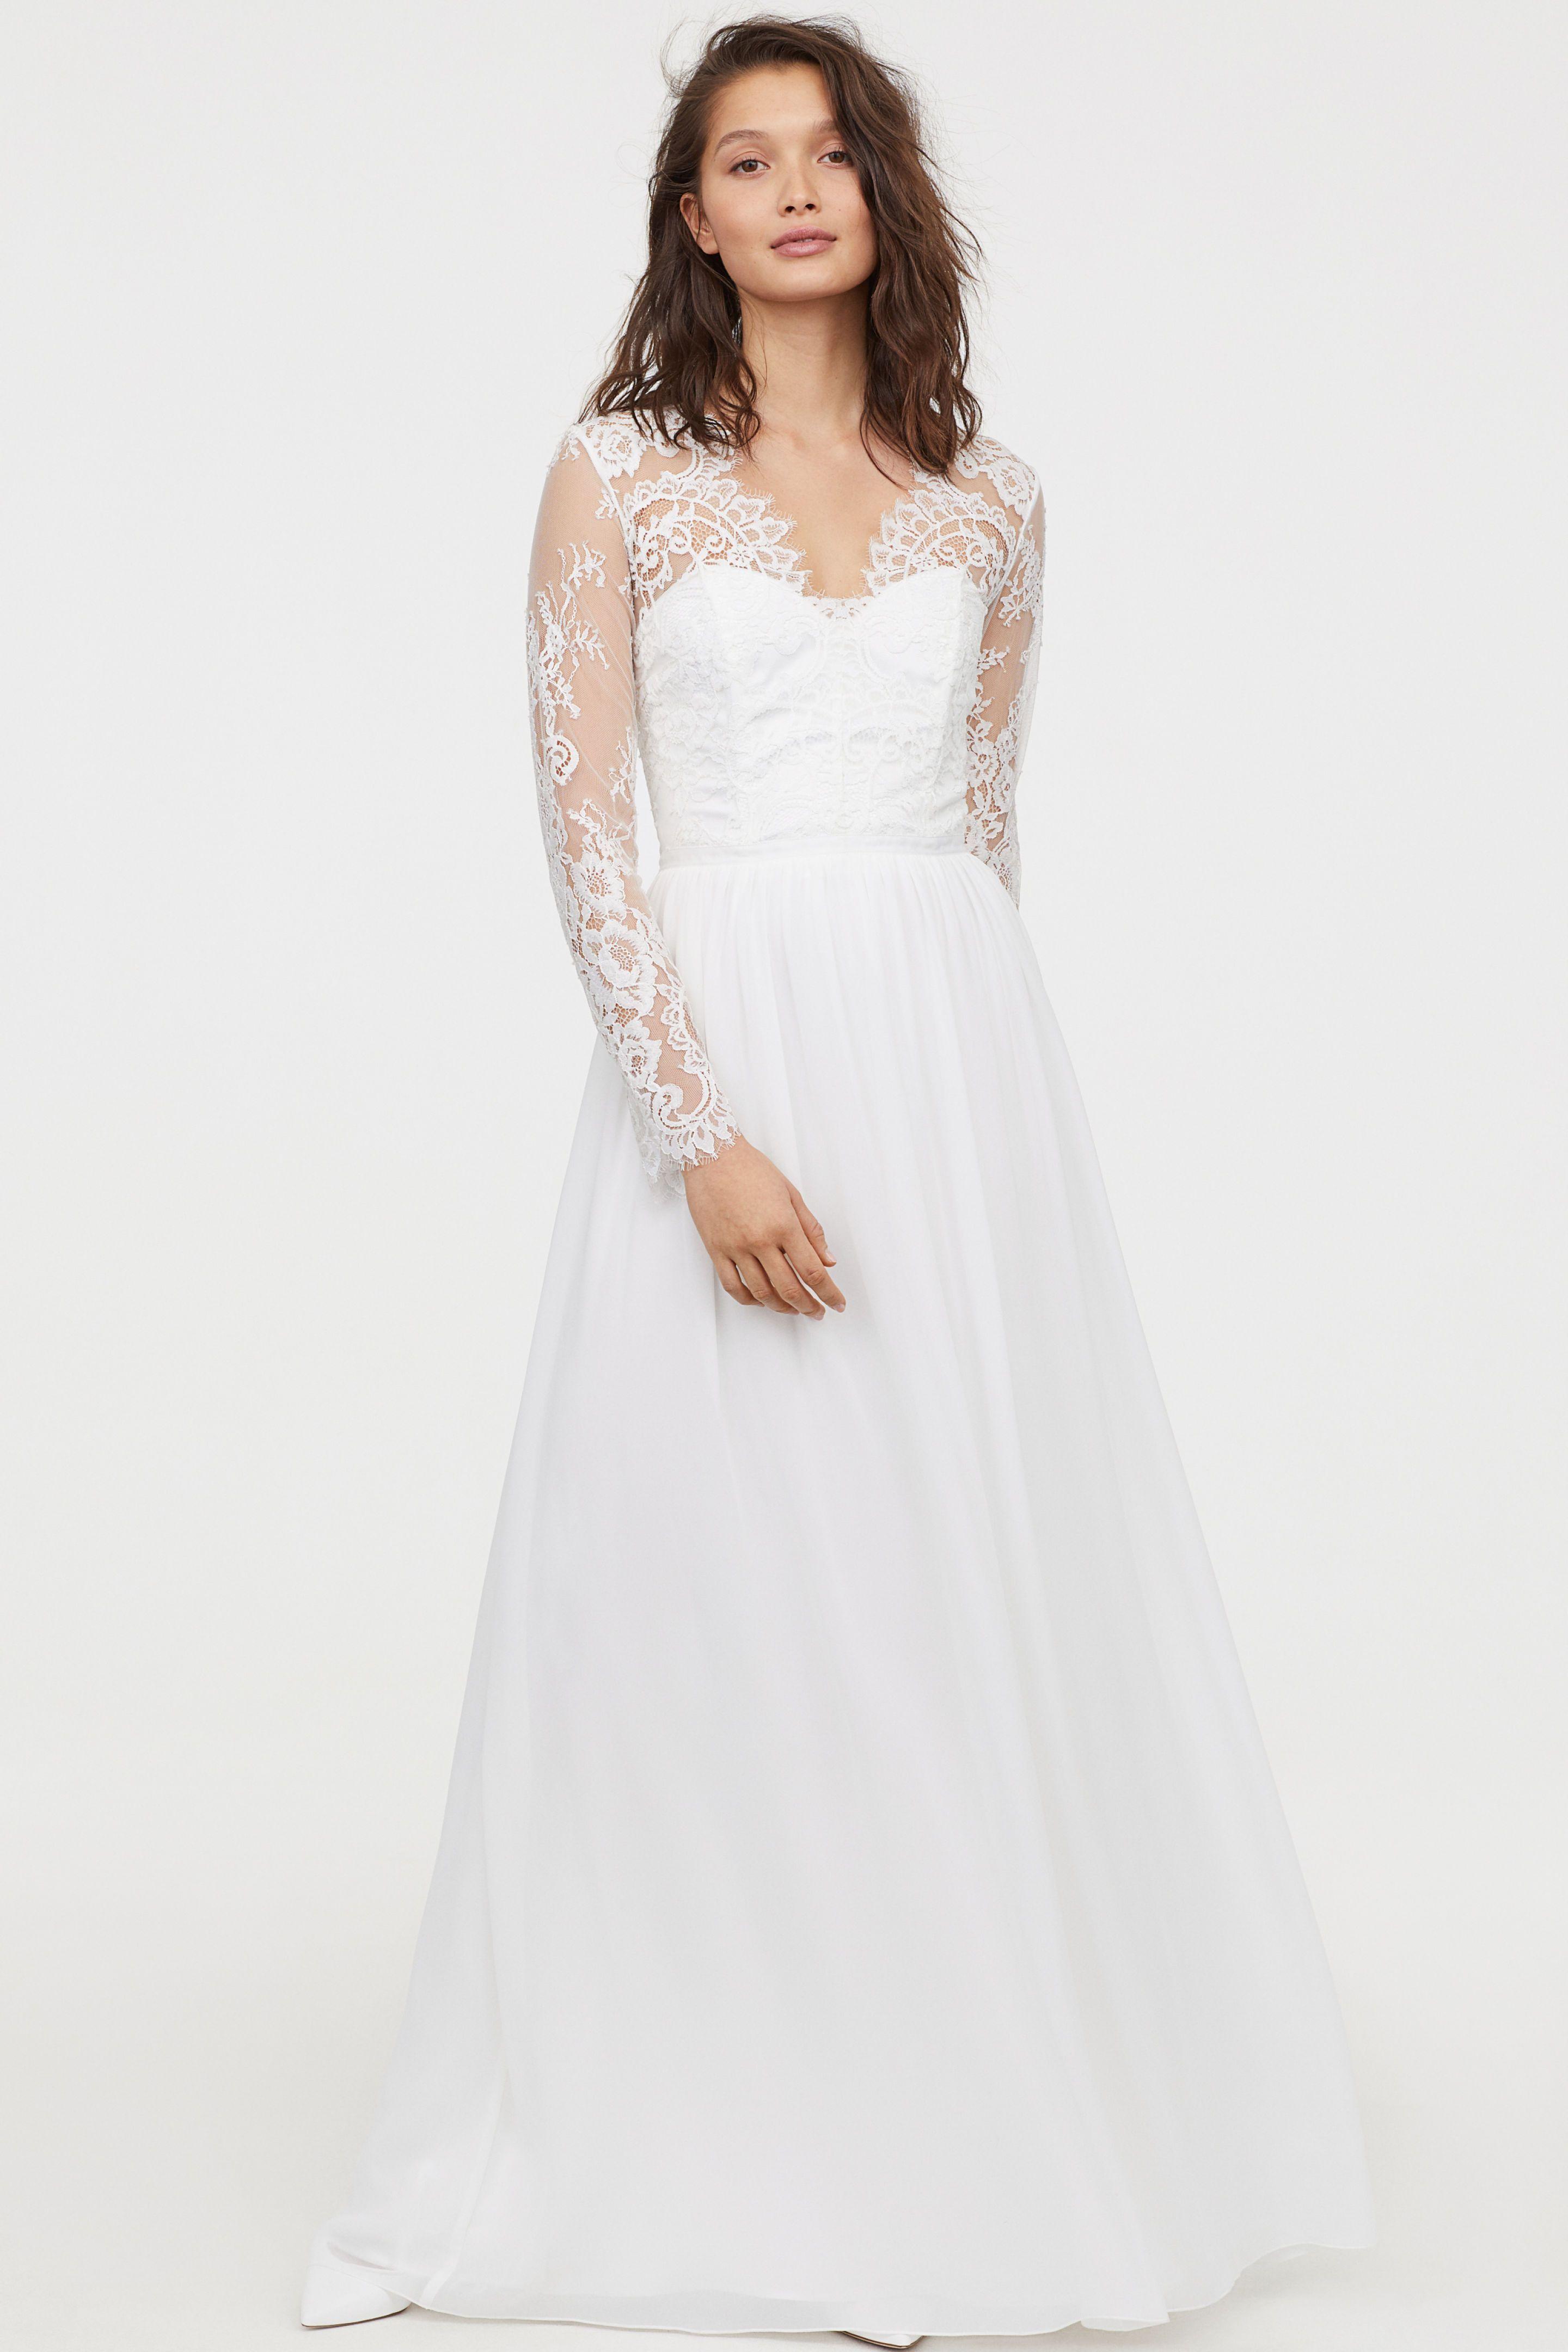 H M Just Restocked Its Kate Middleton Wedding Dress Dupe 19 More Bridal Looks Kate Middleton Wedding Dress Wedding Dresses Uk Cheap Wedding Dress